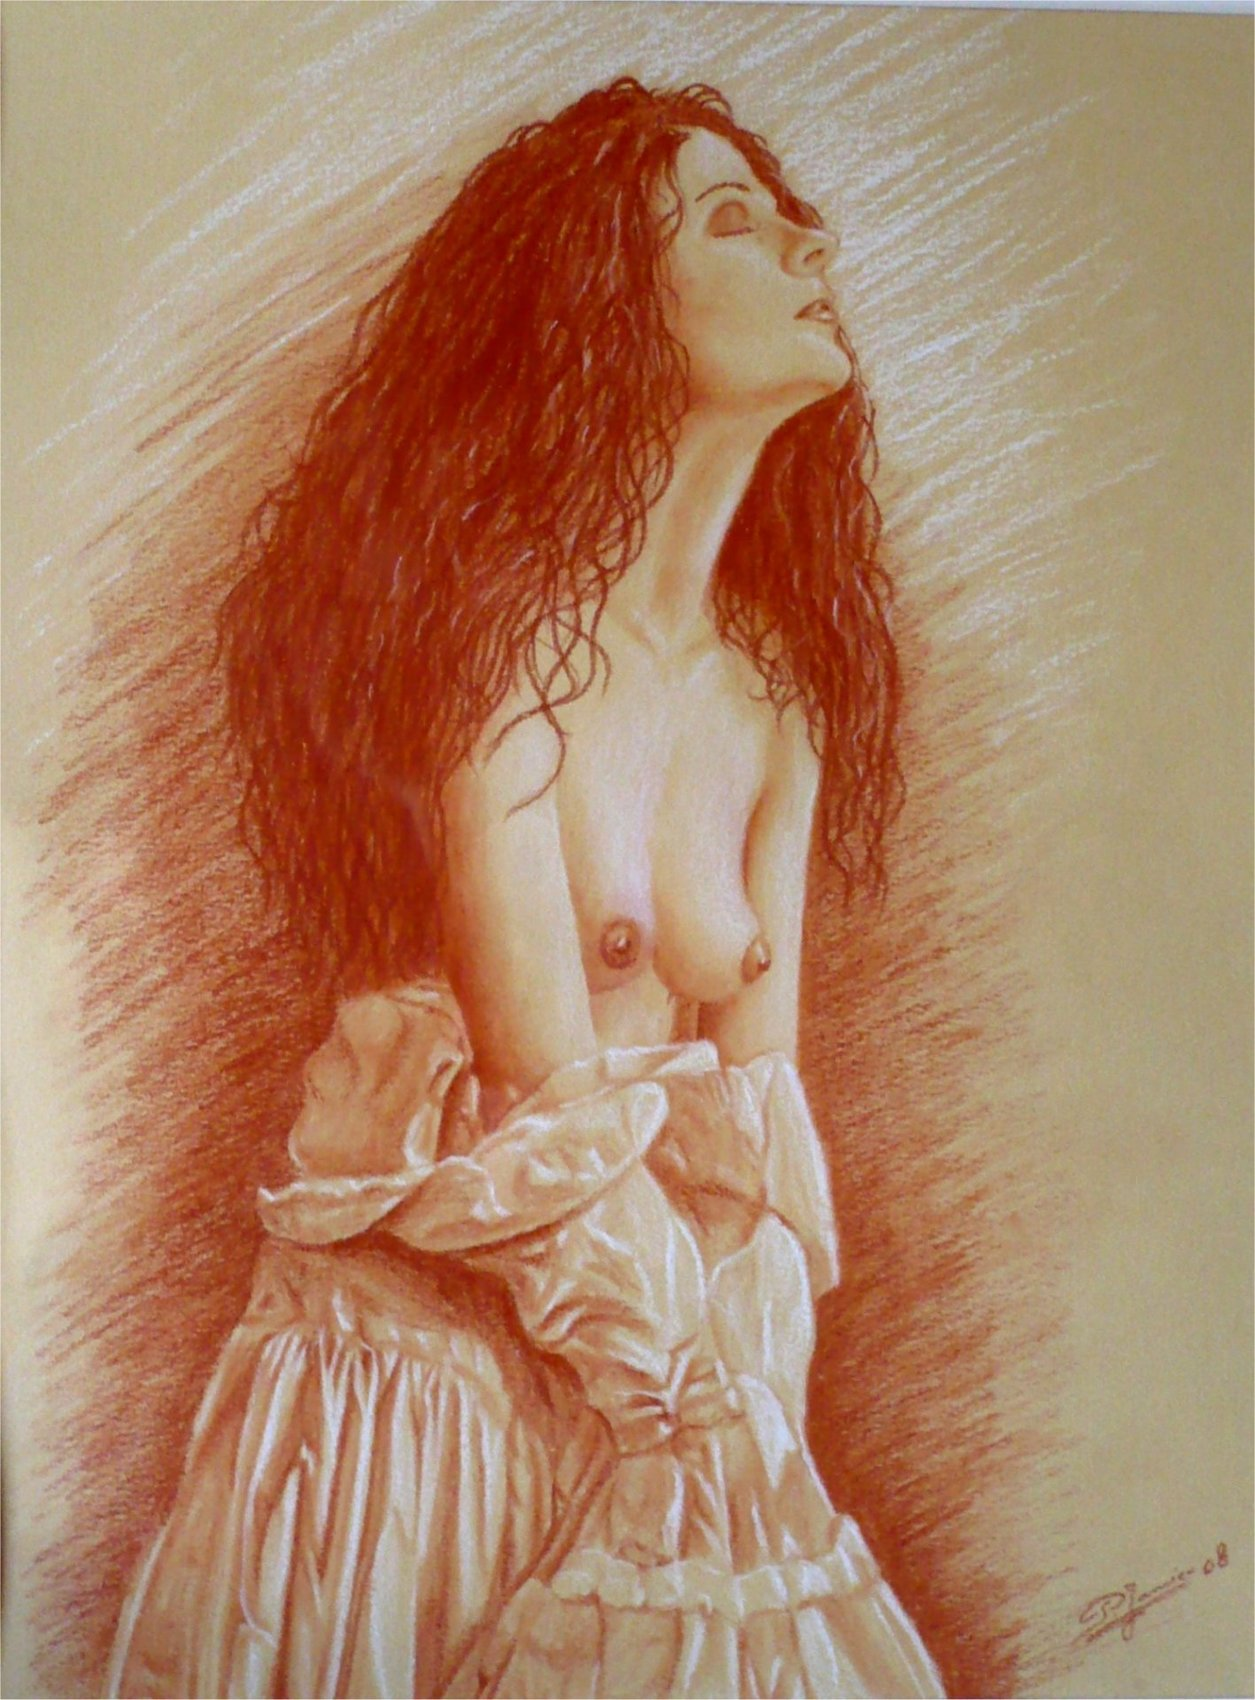 L'éternel féminin